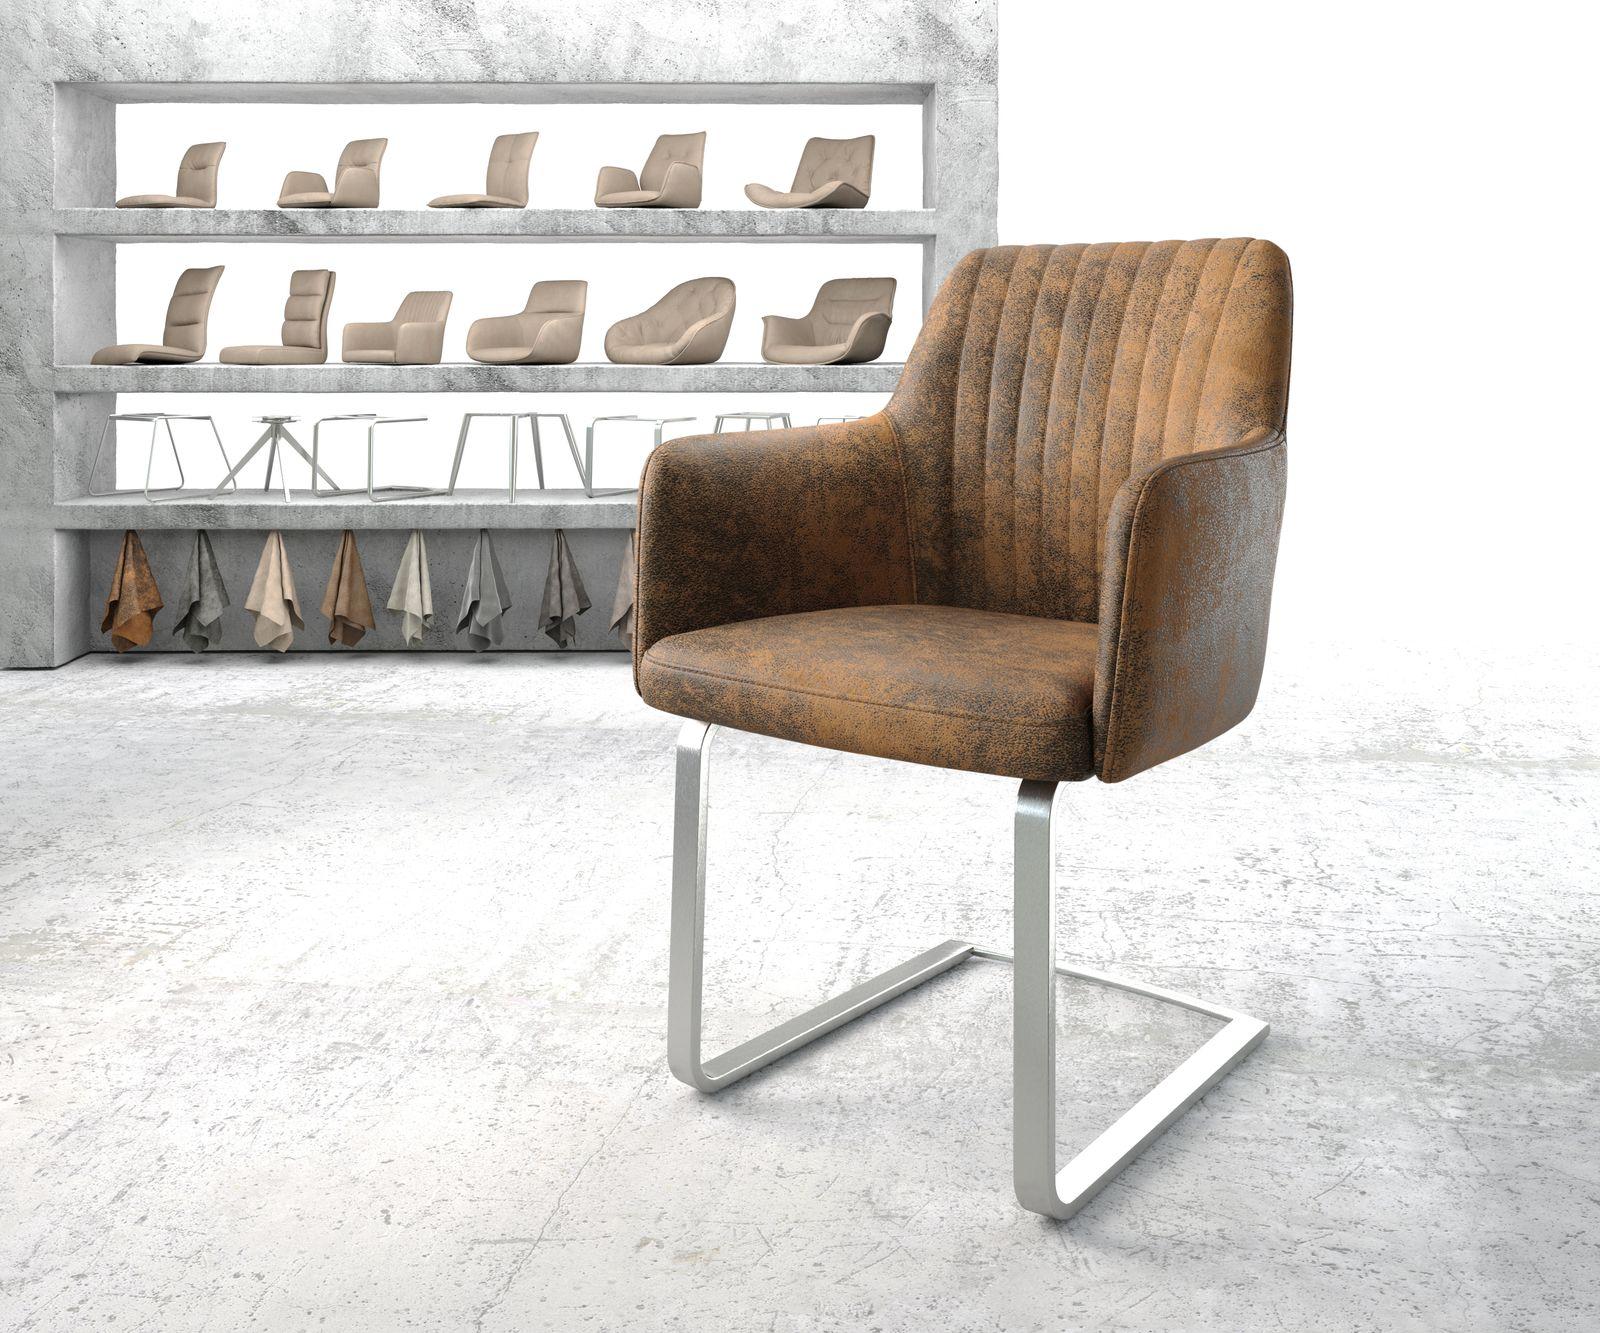 delife-armlehnstuhl-greg-flex-braun-vintage-freischwinger-flach-edelstahl-esszimmerstuhle, 119.90 EUR @ delife-de